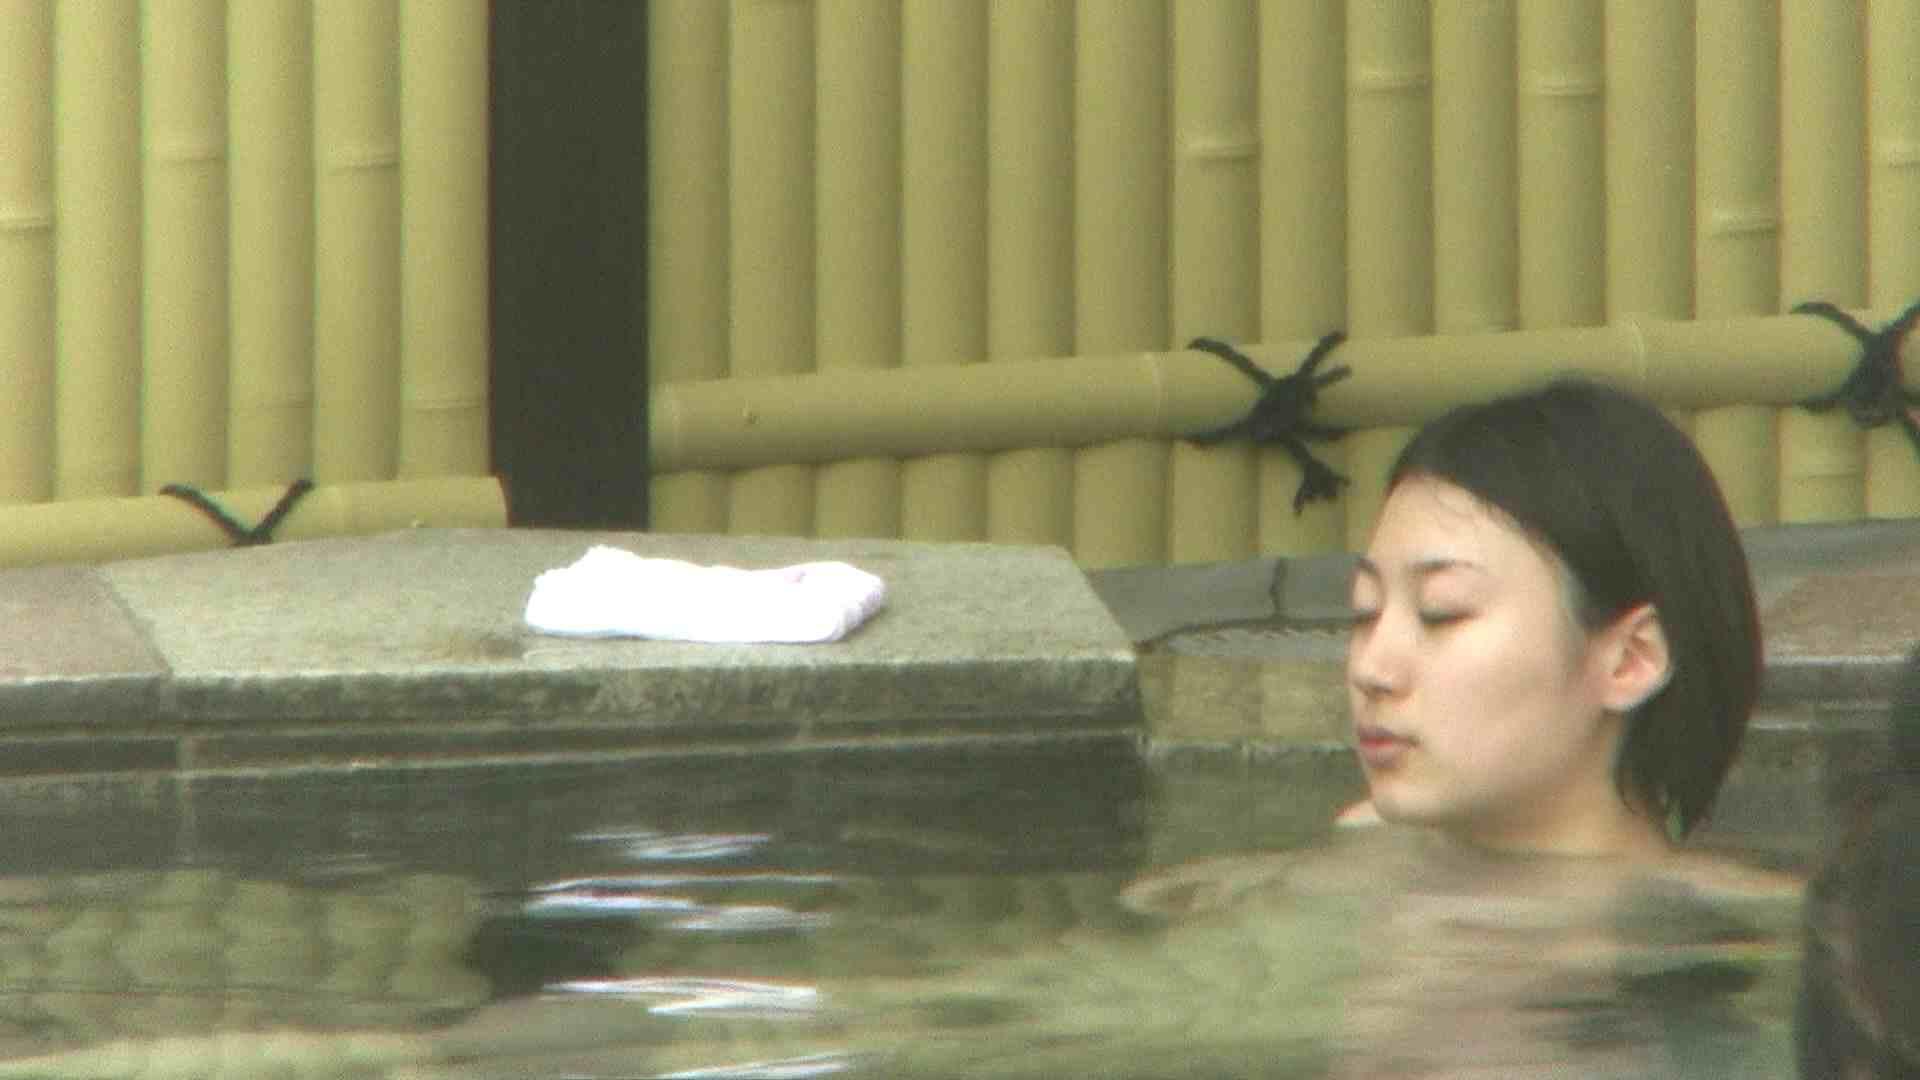 Aquaな露天風呂Vol.123 露天 | HなOL  75pic 1